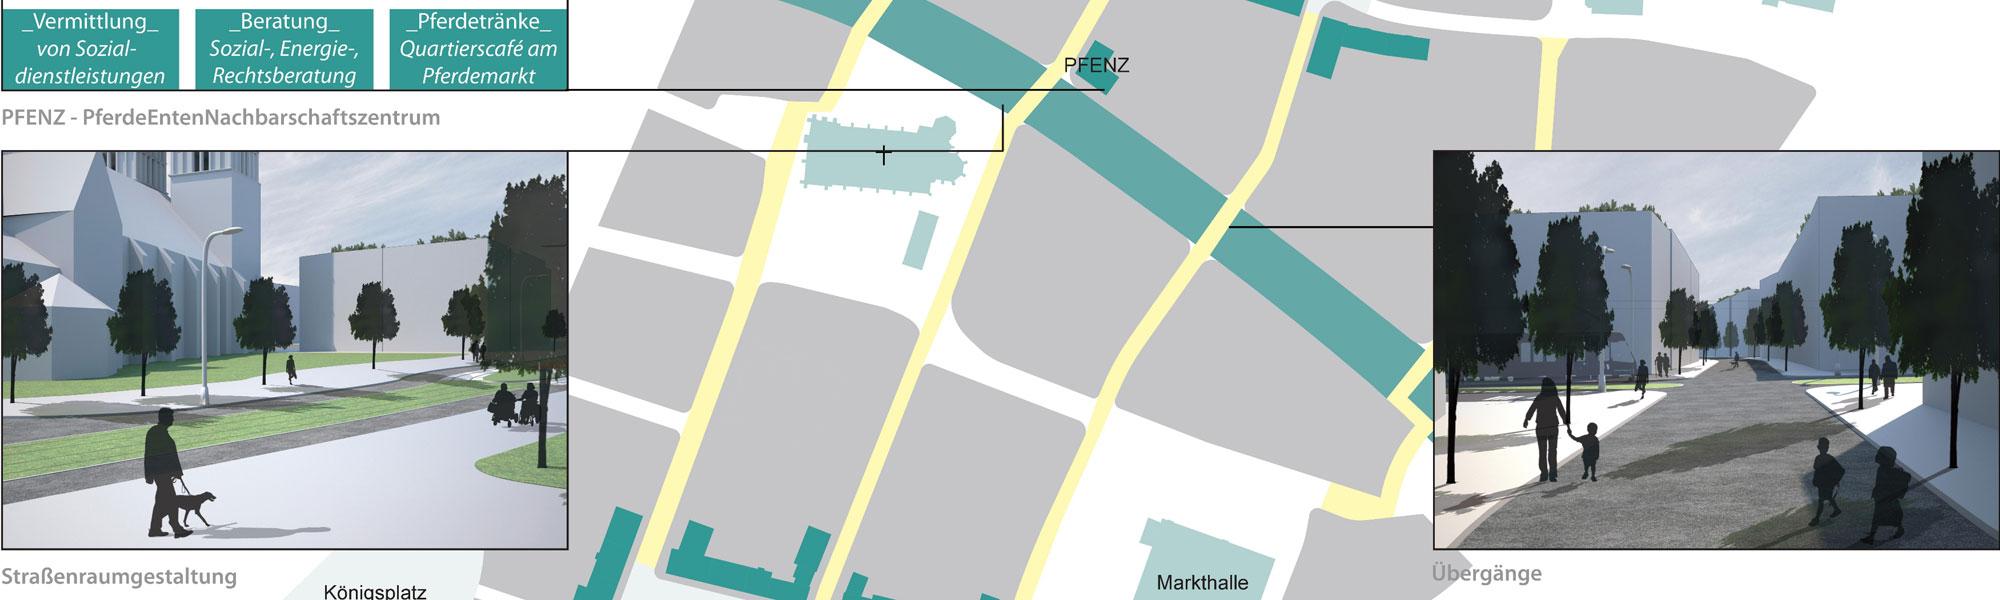 Titelbild NAT-UR-BAN Kassel: Ausschnitt Lageplan